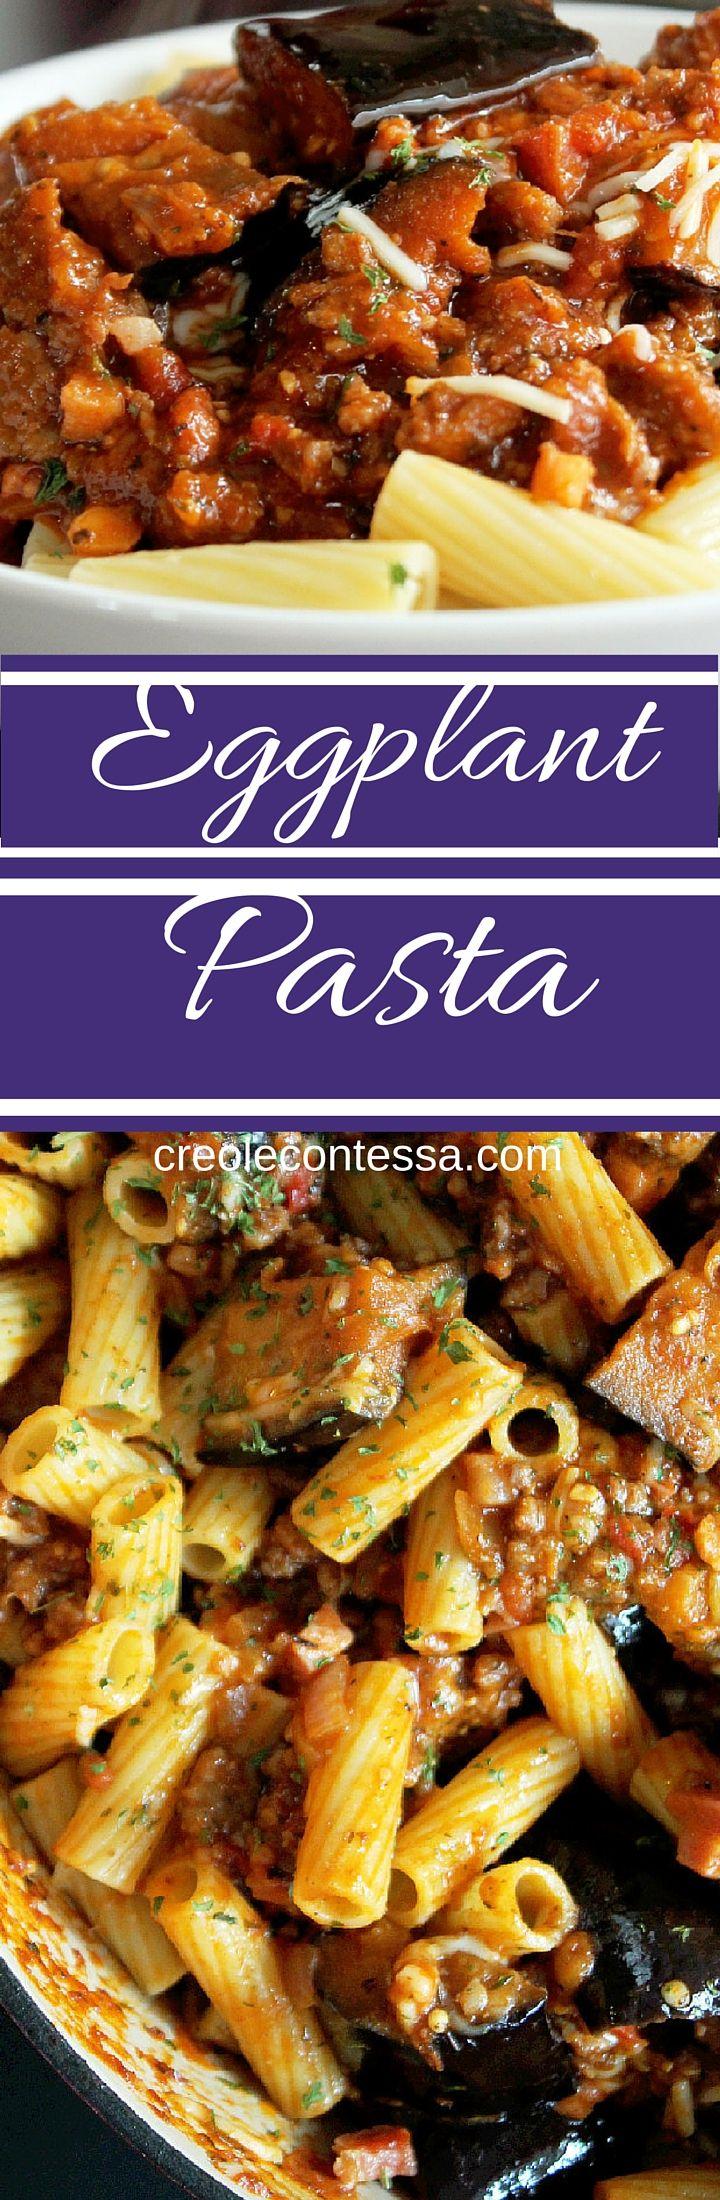 Pasta with Eggplant, Sausage and Pancetta -Creole Contessa